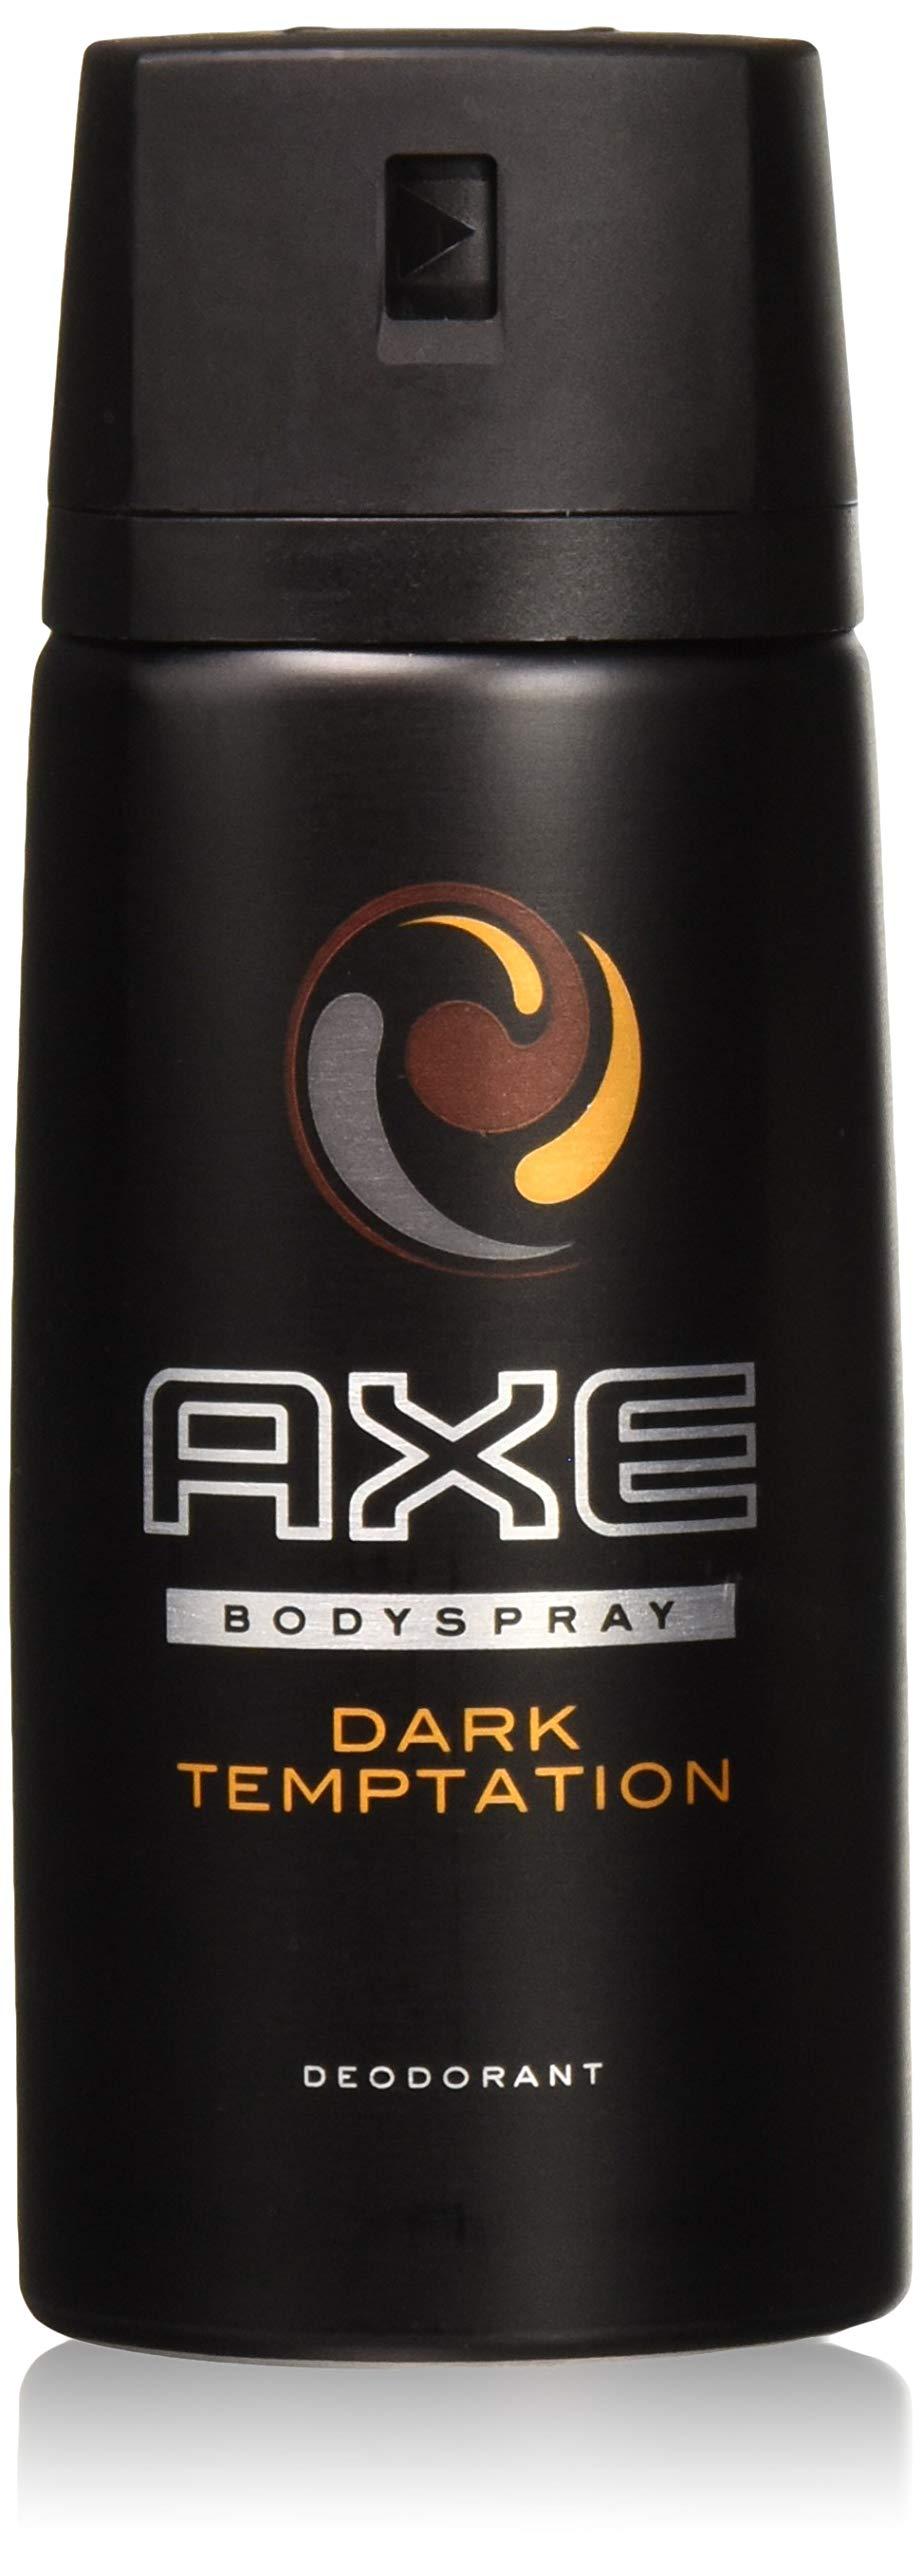 Deodorant Body Spray Dark Temptation